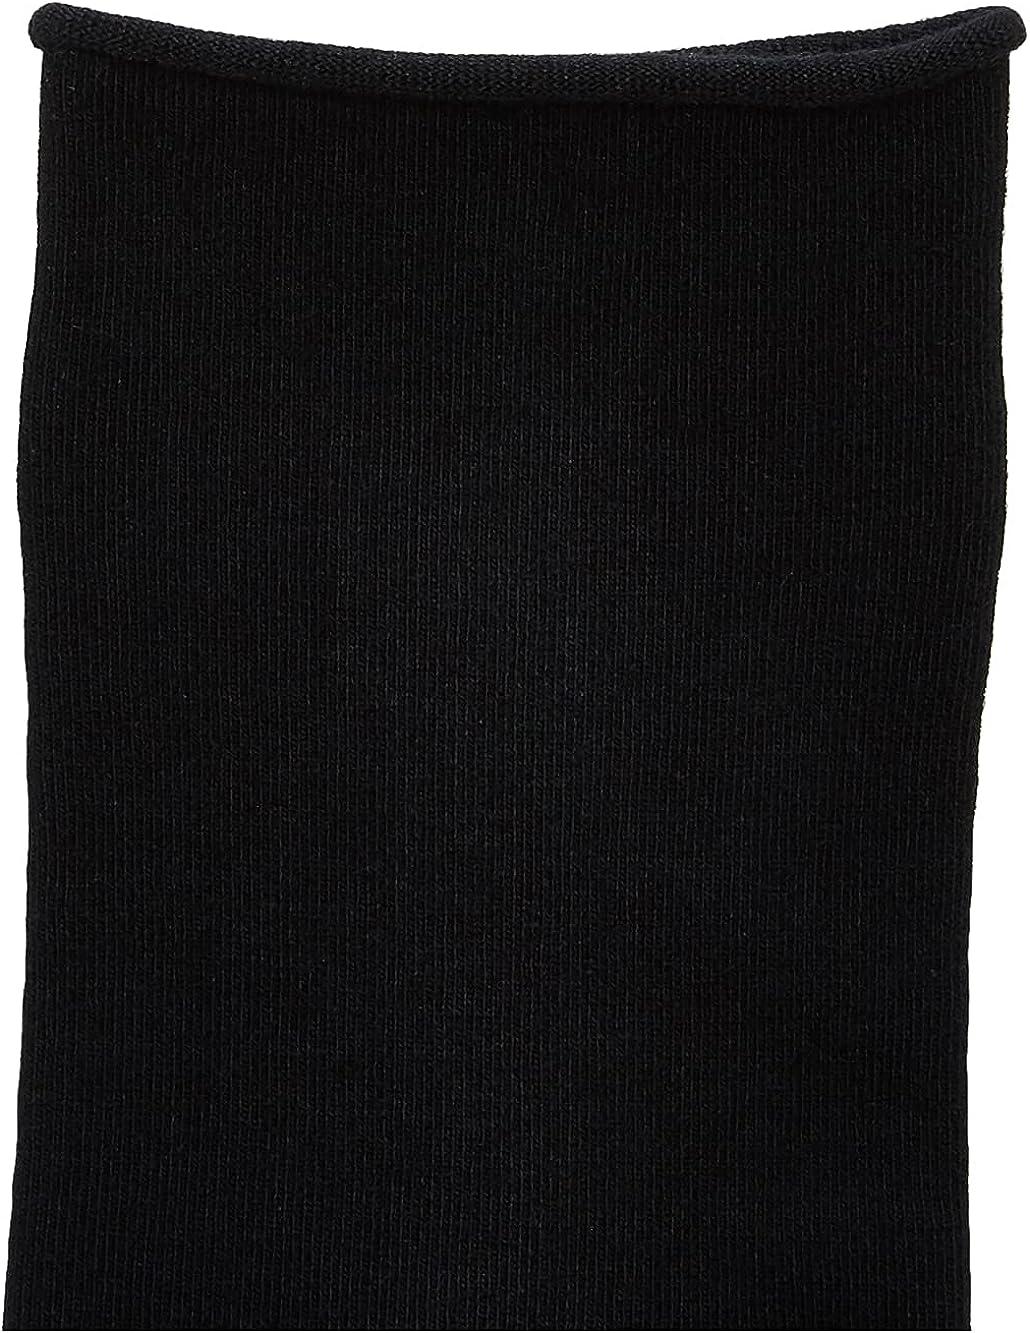 HUE Women's Jean Crew Socks, 3 Pair Pack